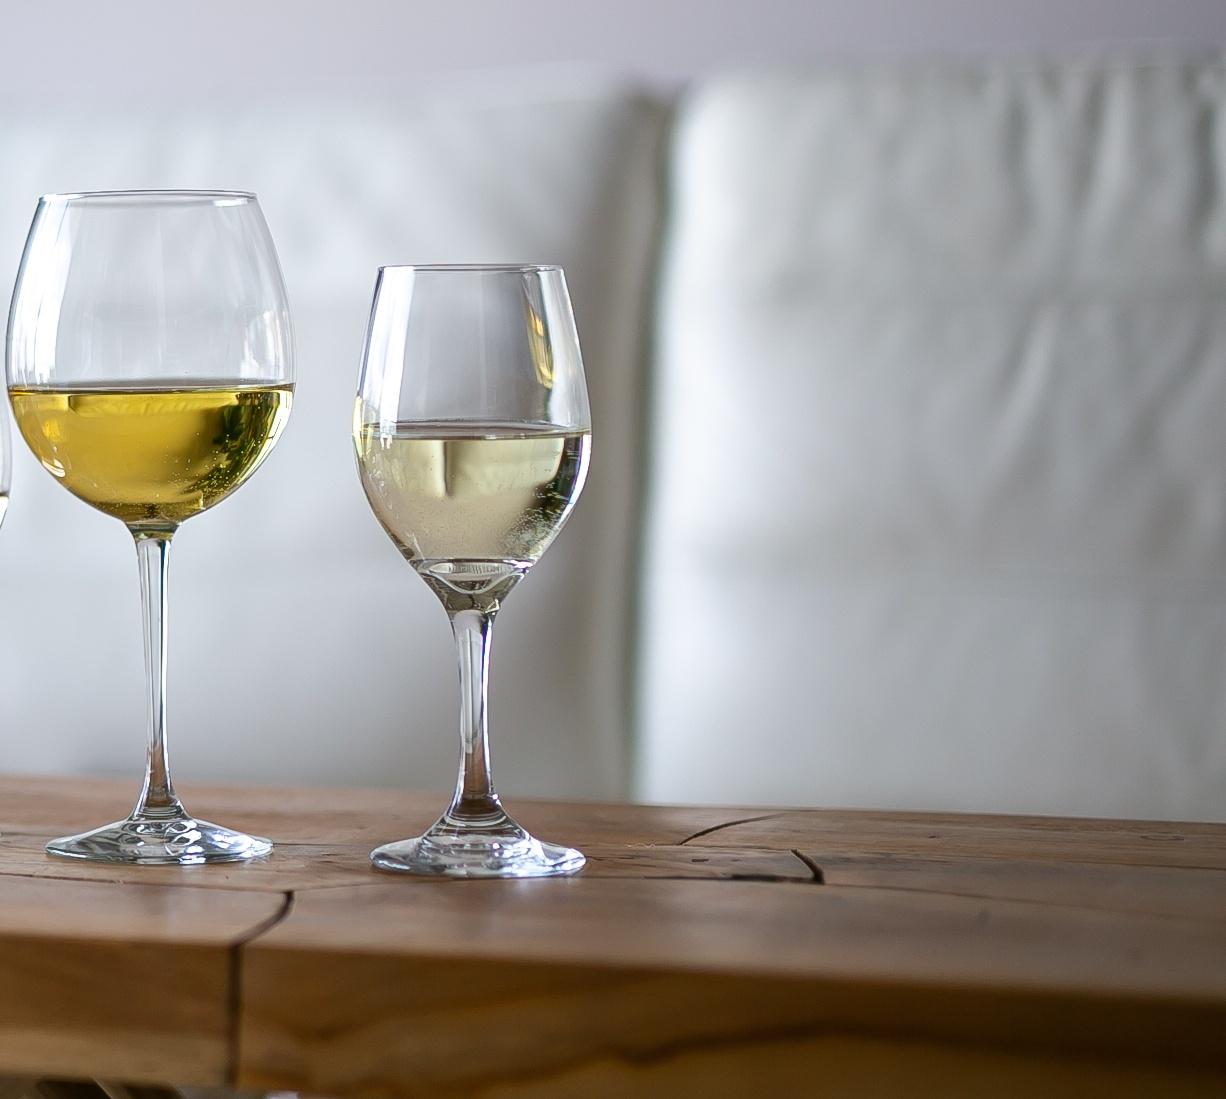 Choosing the best White Wine